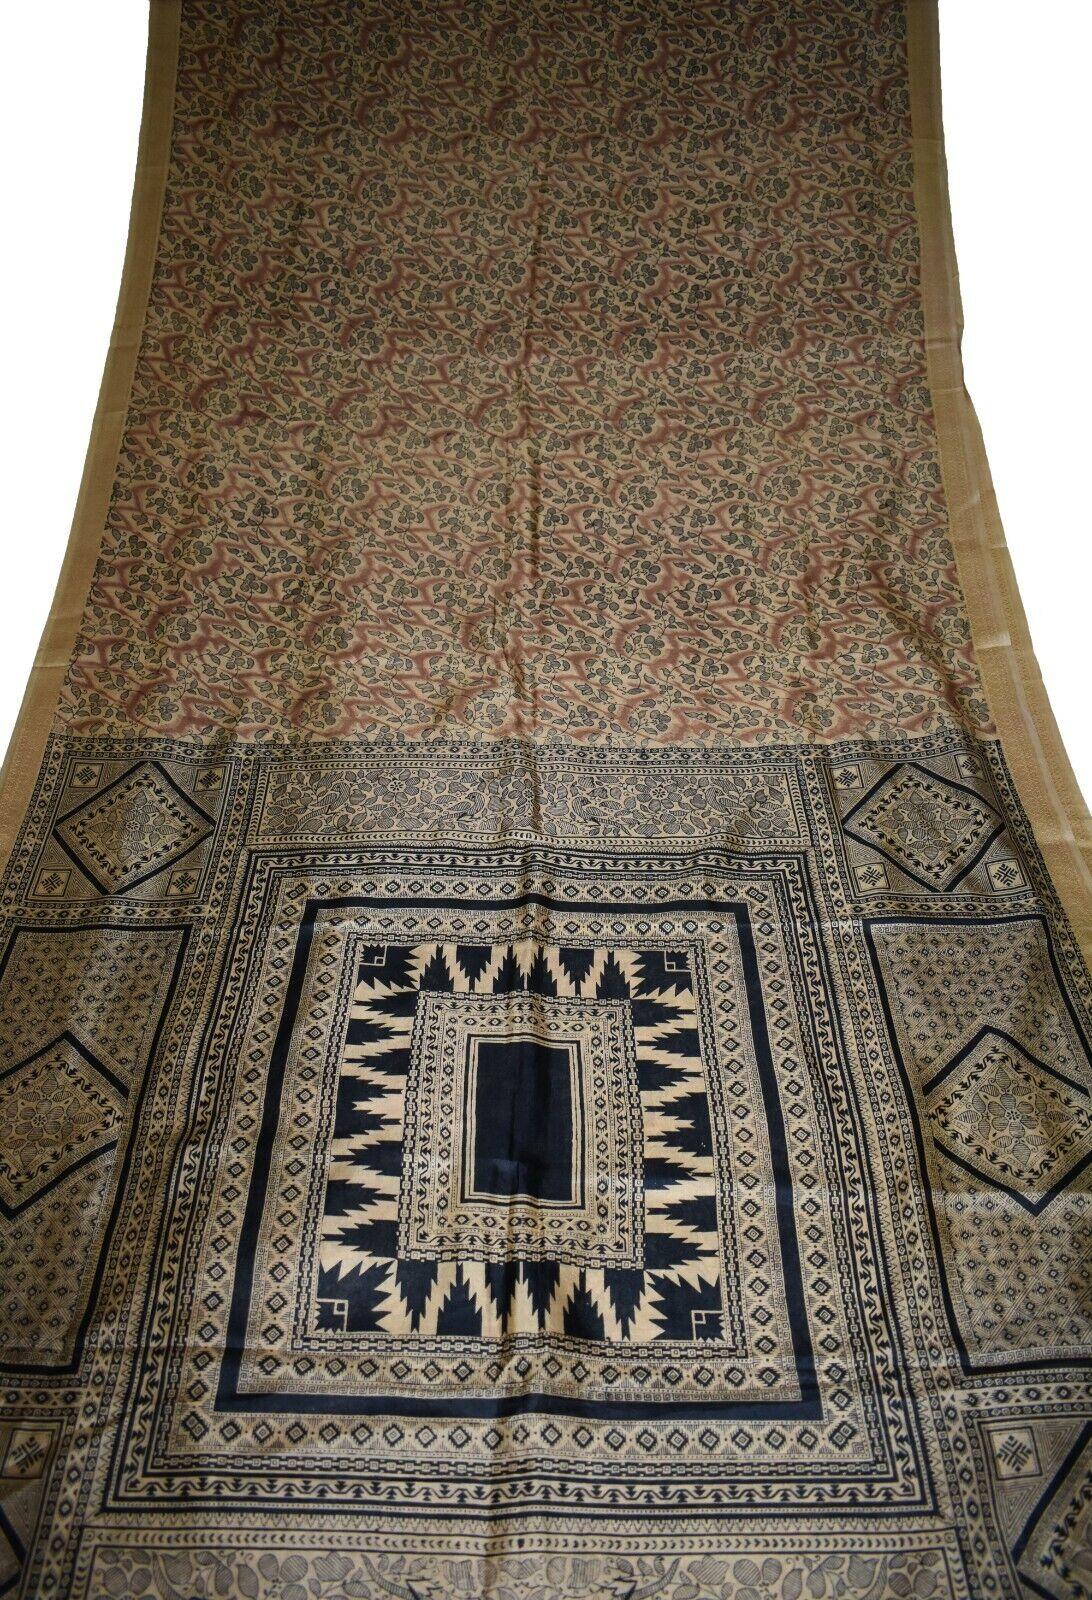 Vintage Printed Saree Brown Pure Silk Floral Print Sari Design Craft IPR-6808